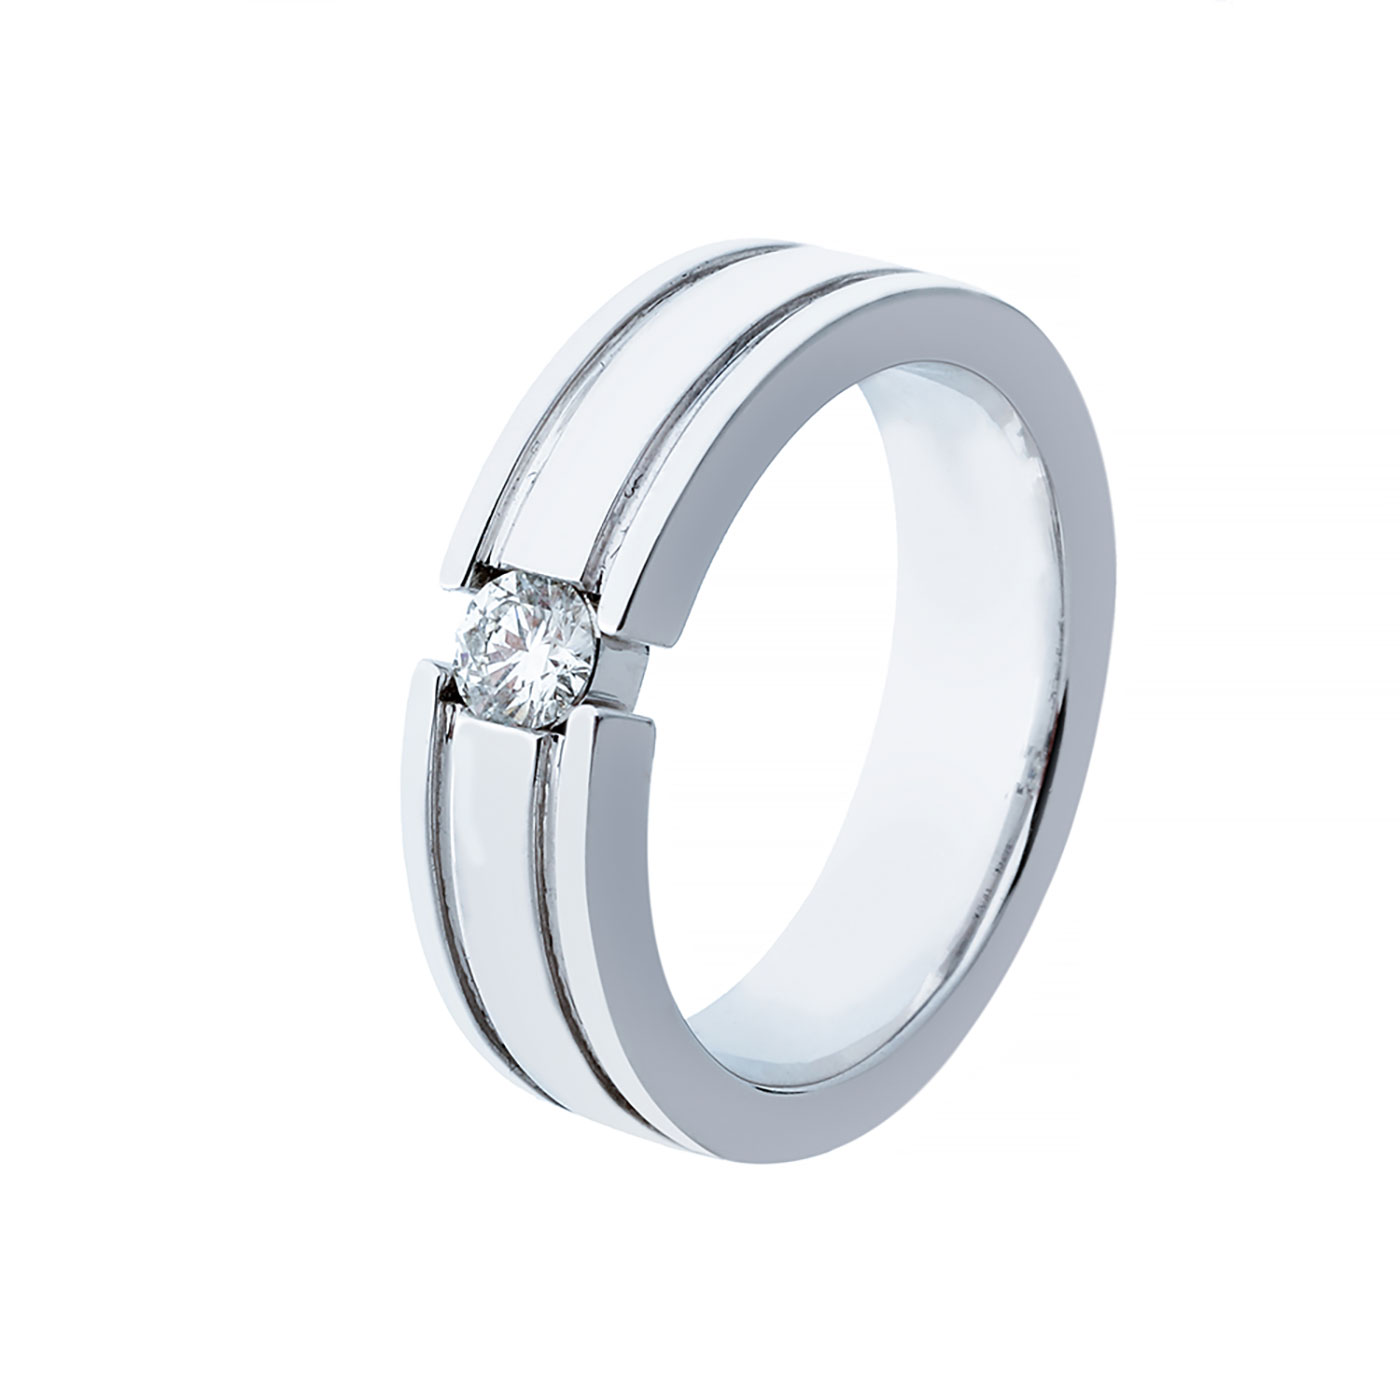 حلقه برليان 75338 A گوهربين goharbin